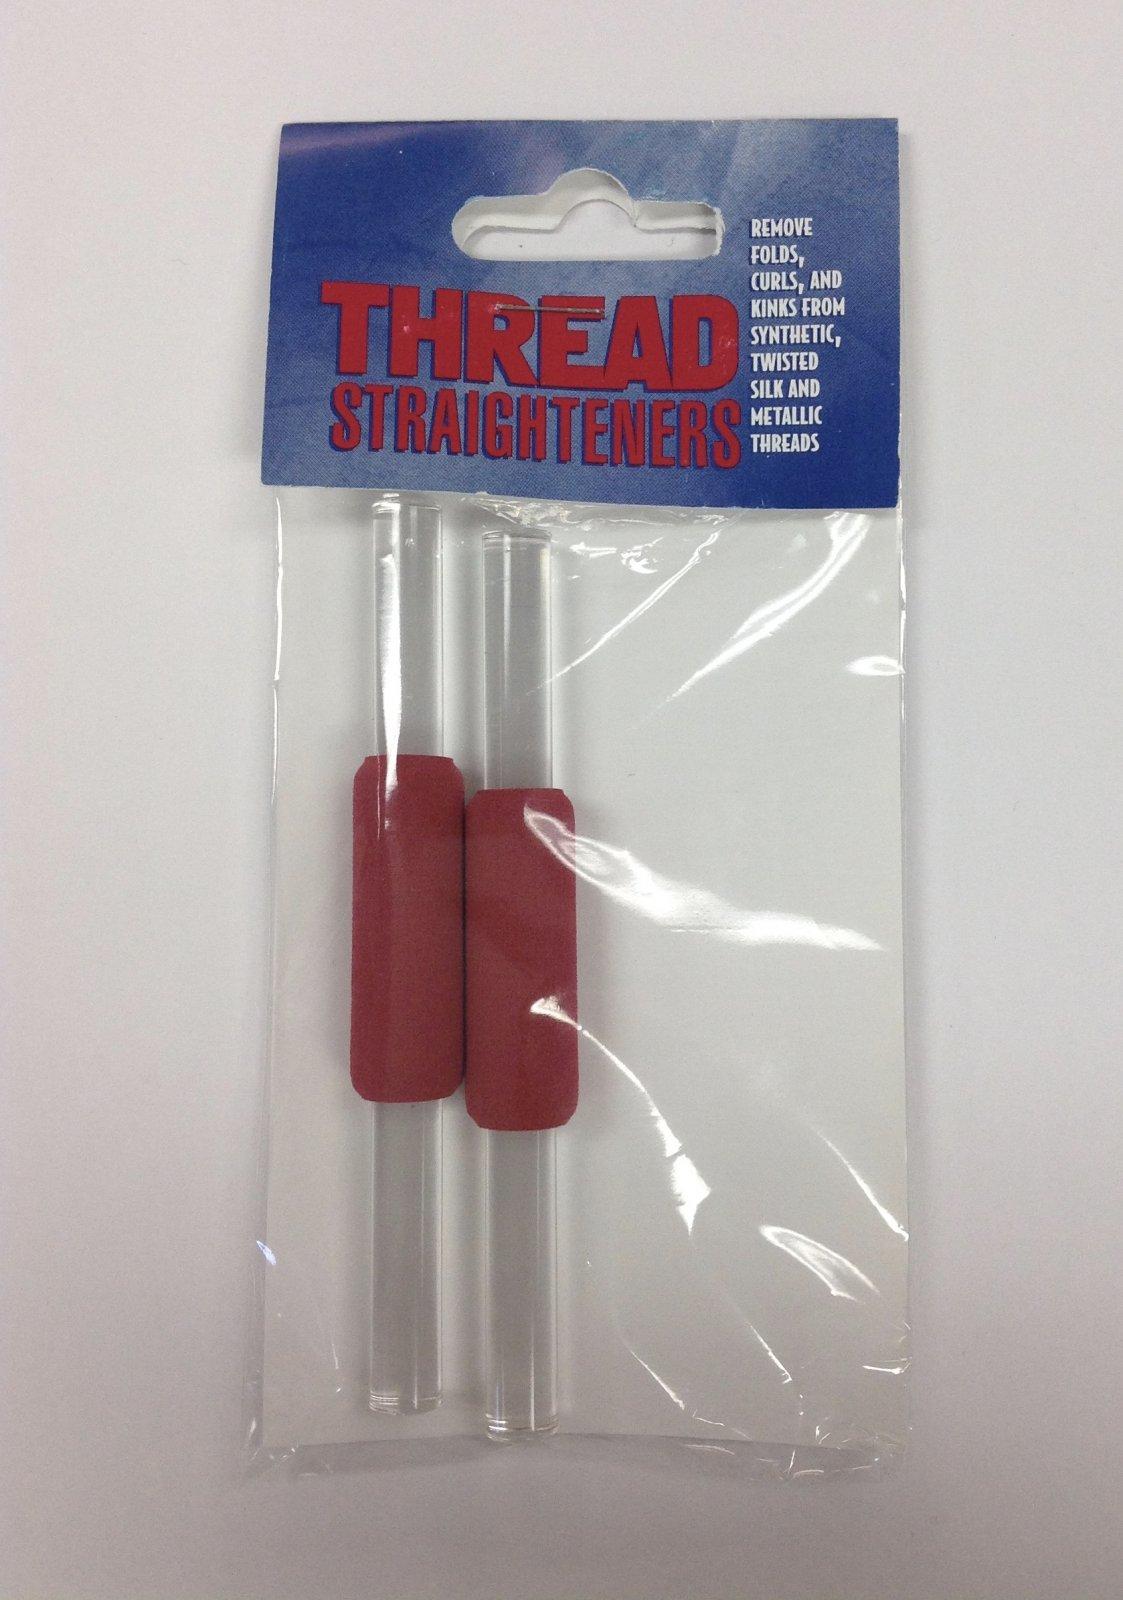 foam thread straighteners